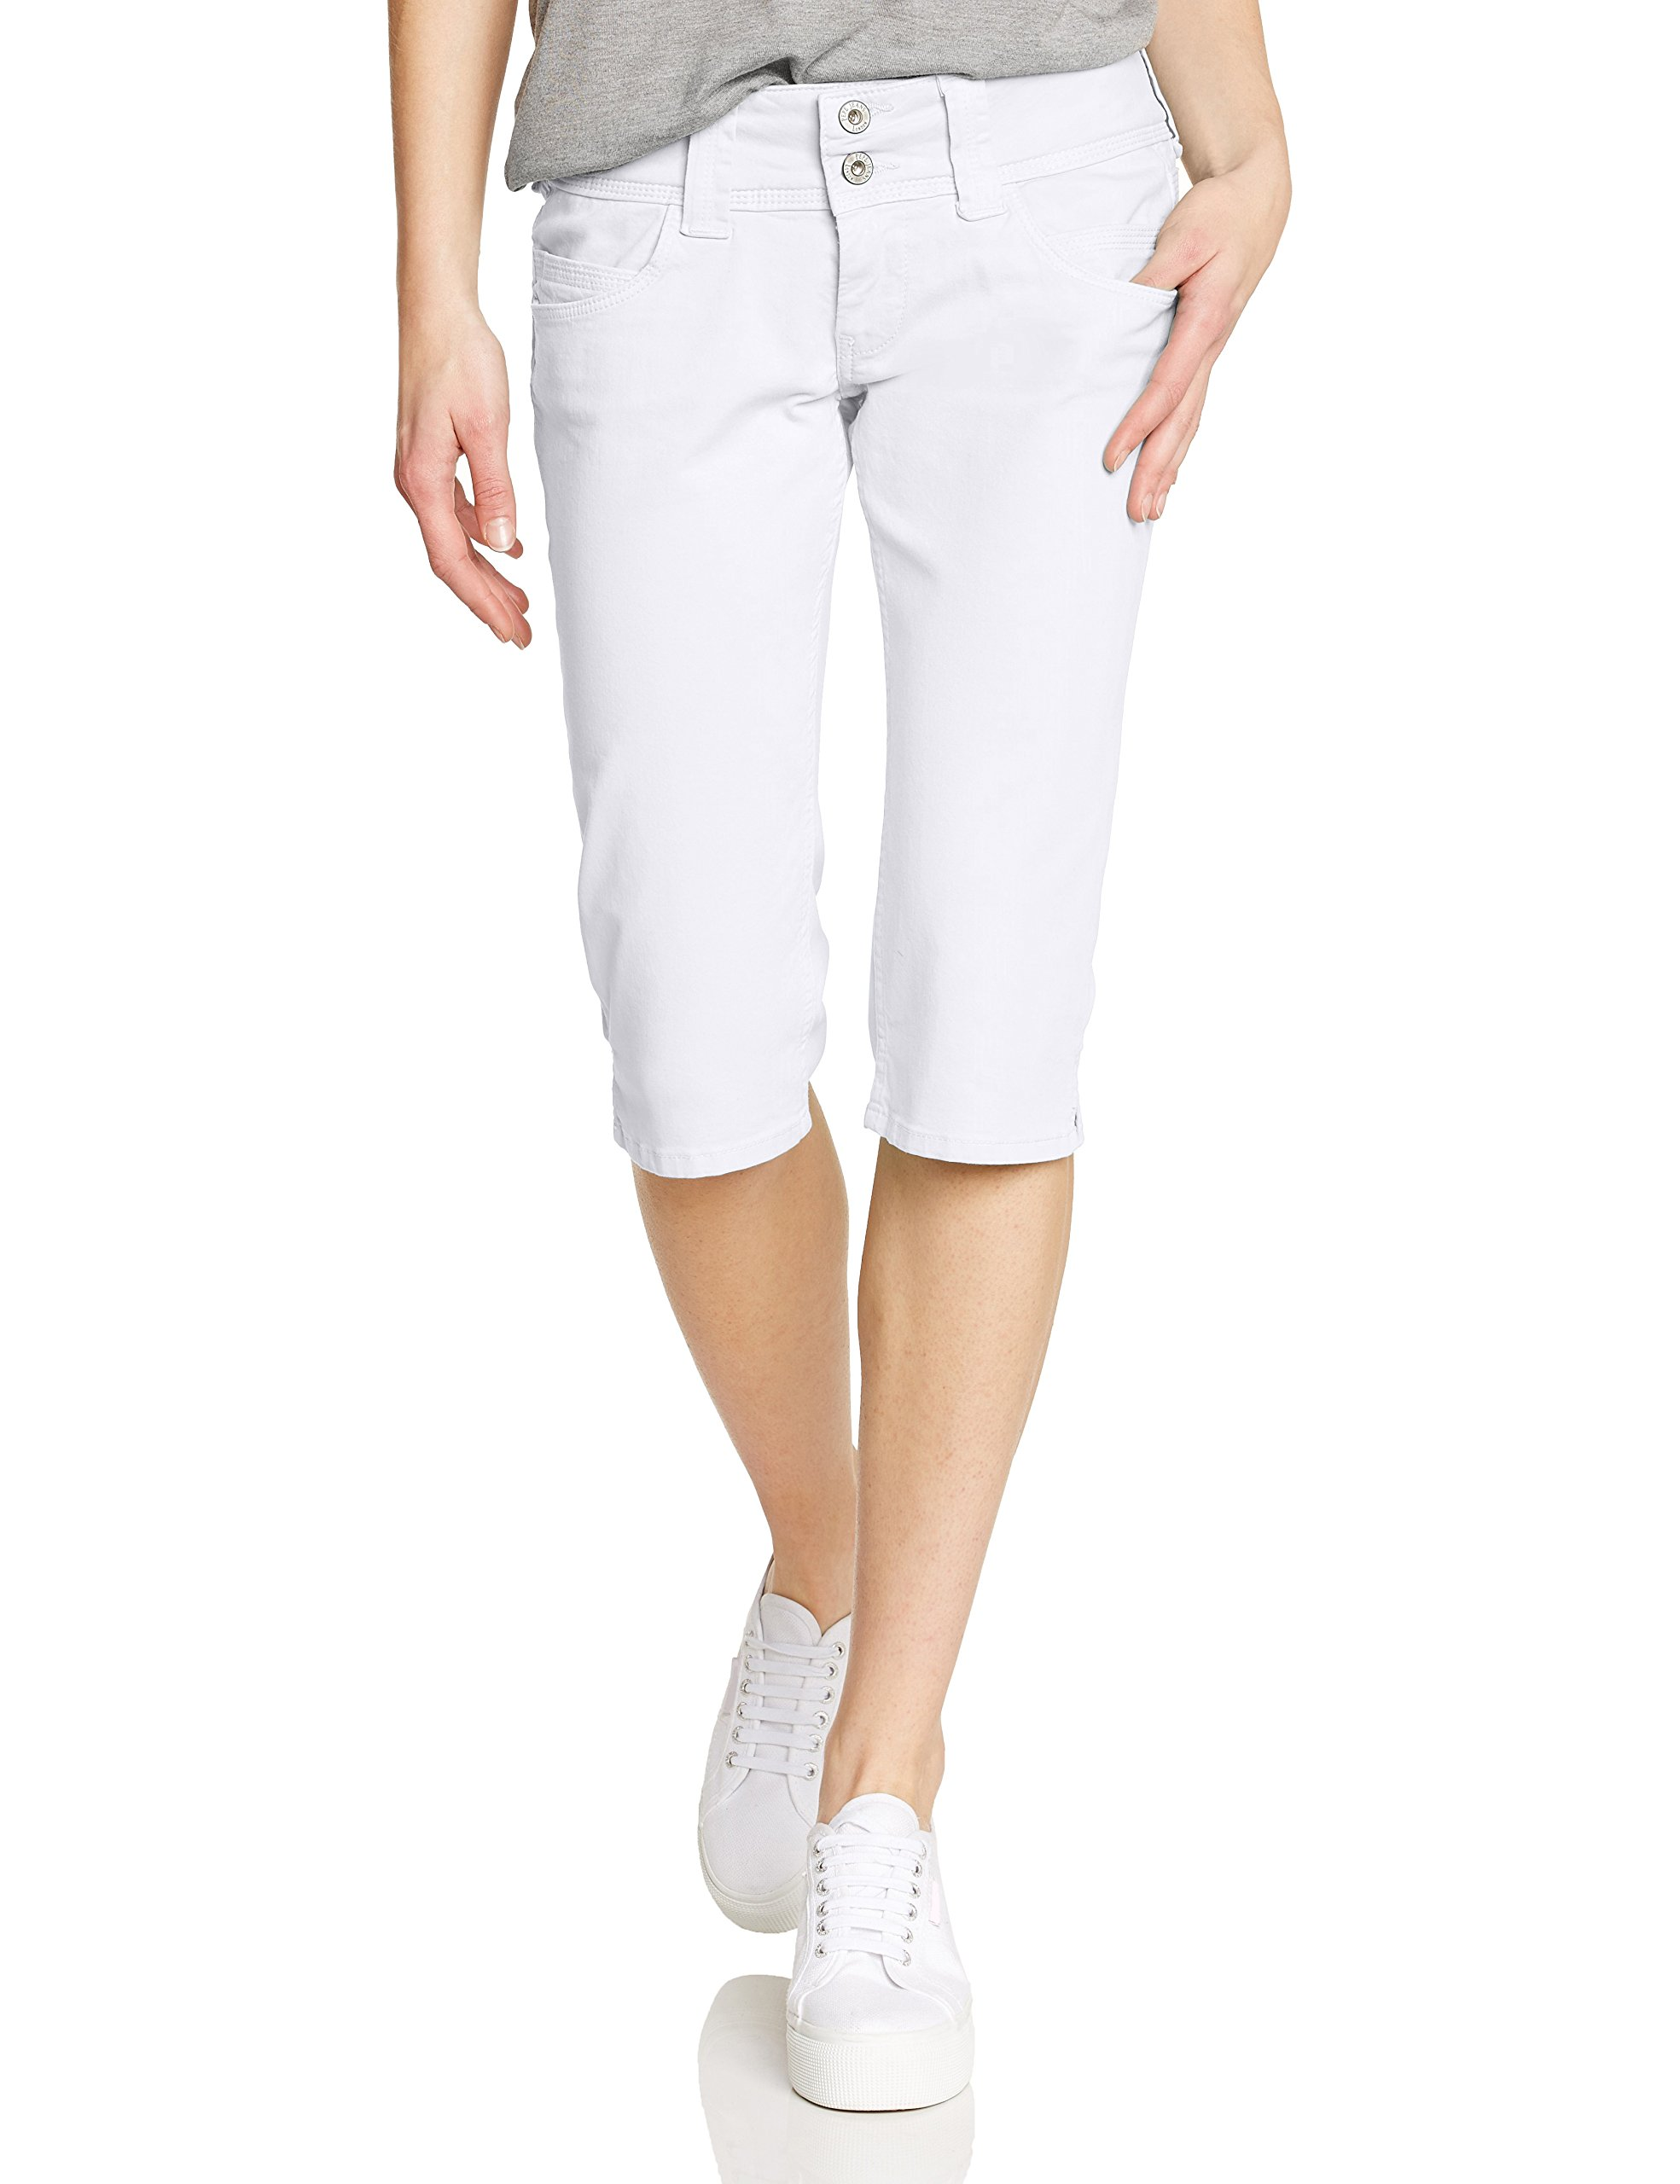 CropShort Venus Jeans Pepe Fabricant32 FemmeBlancwhiteW32taille mnN80w